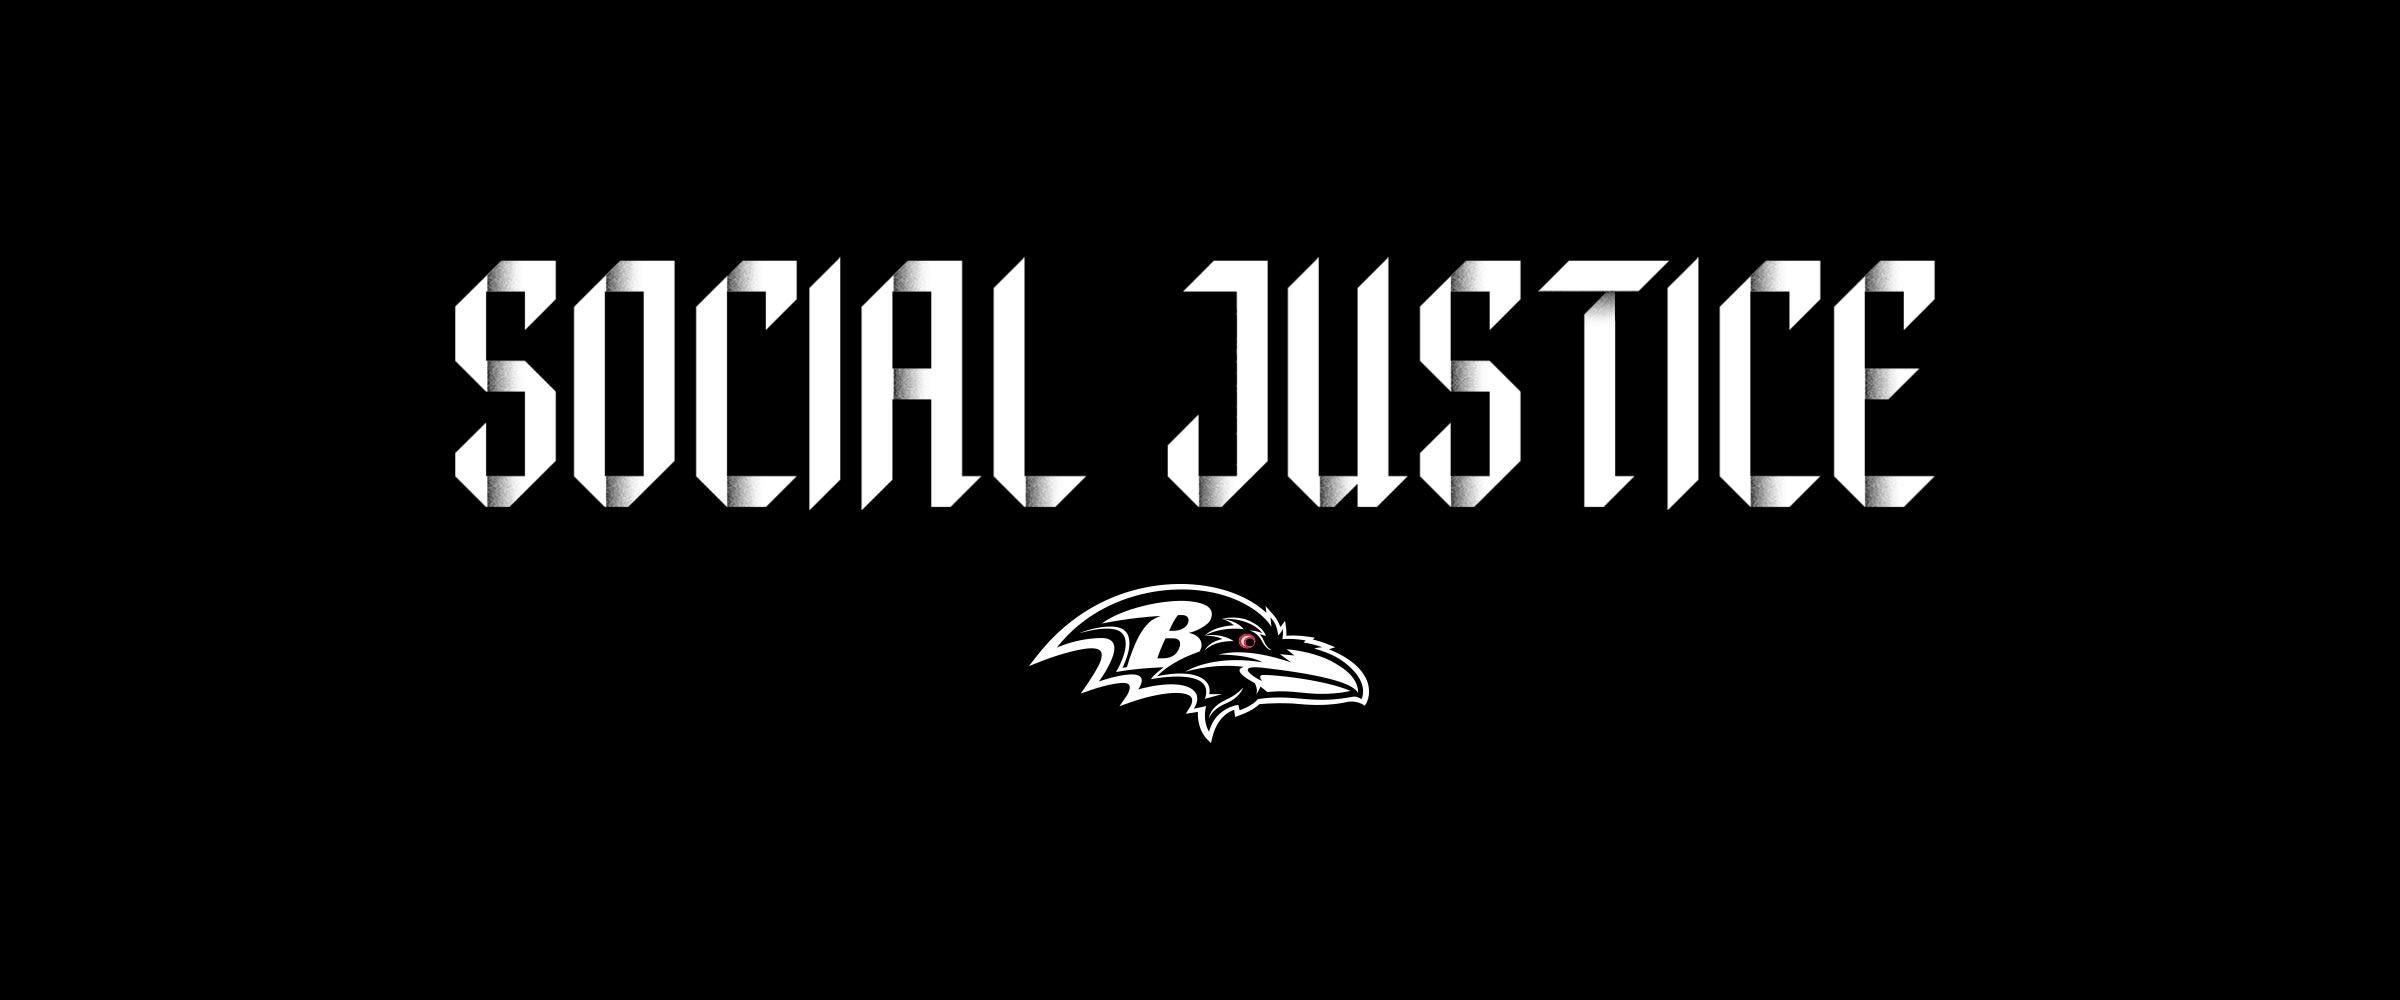 Ravens Social Justice